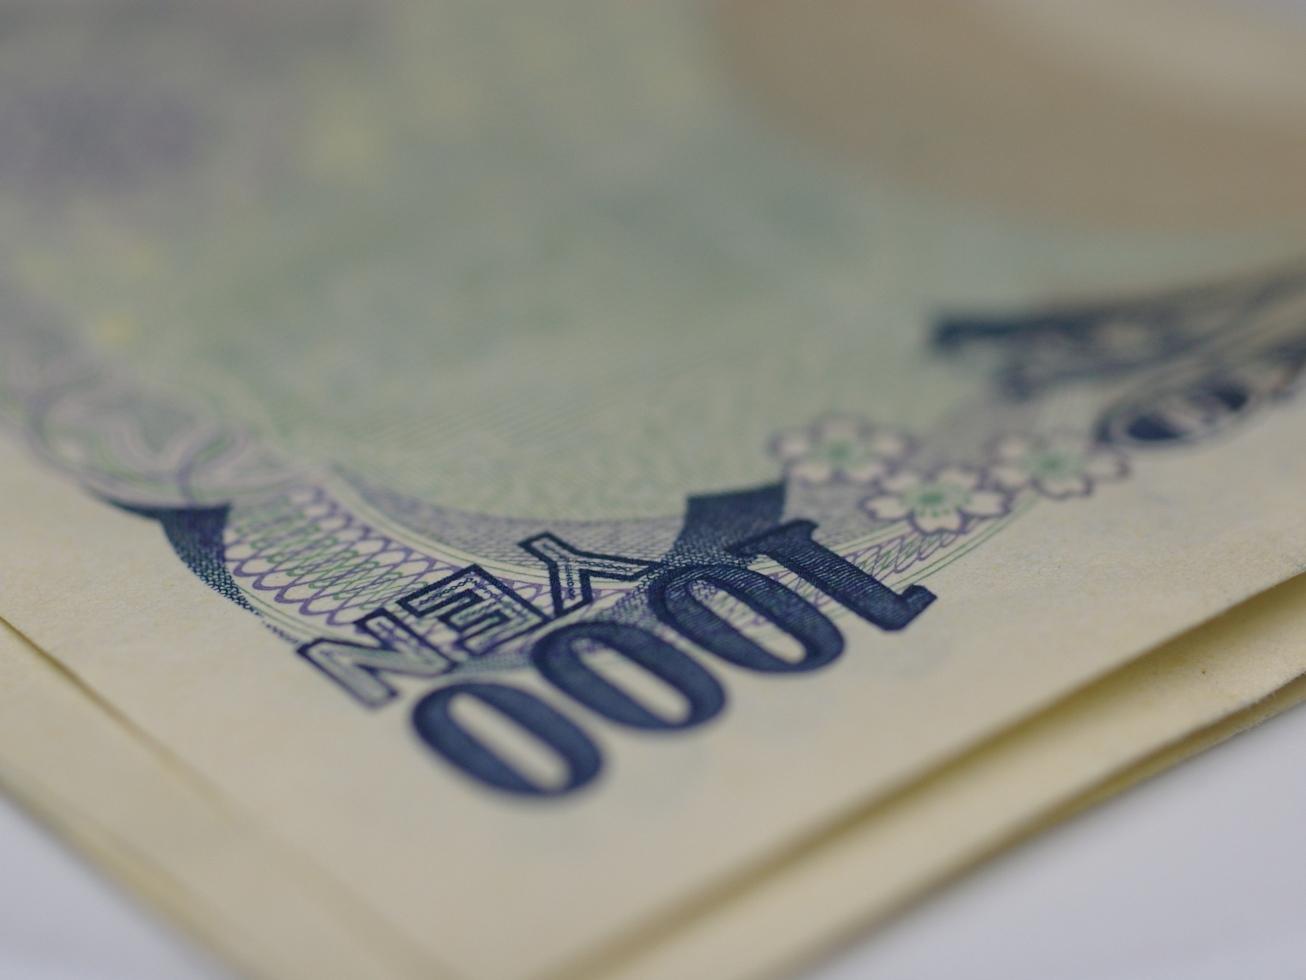 Teletrade отзывы о спросе на японскую валюту